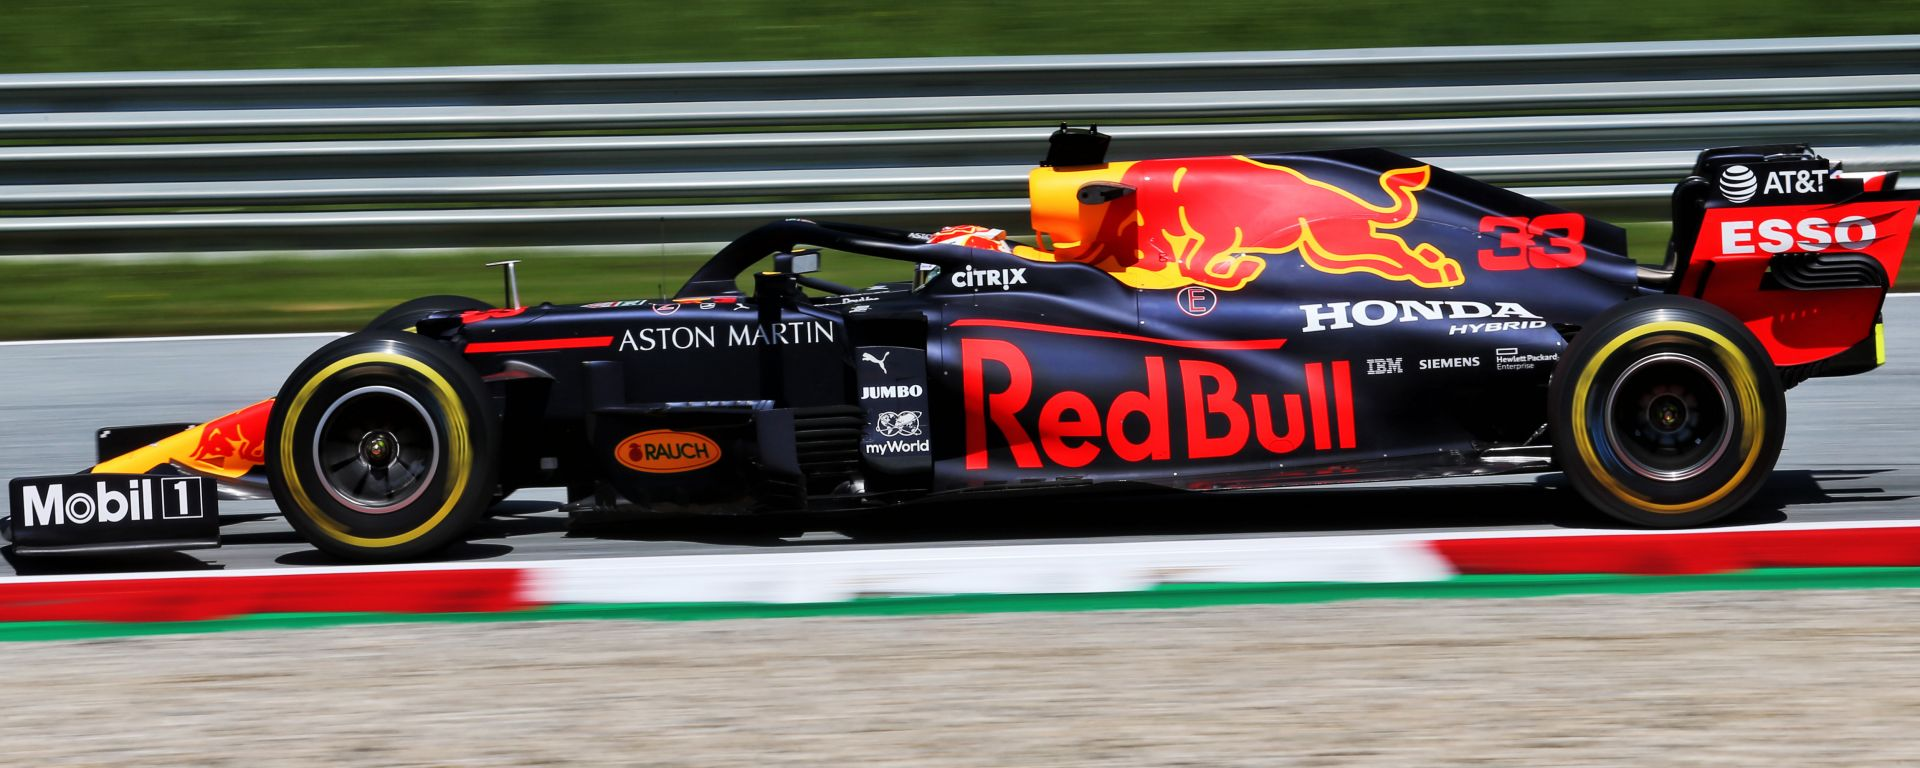 F1 GP Stiria 2020, Red Bull Ring: Max Verstappen (Red Bull)